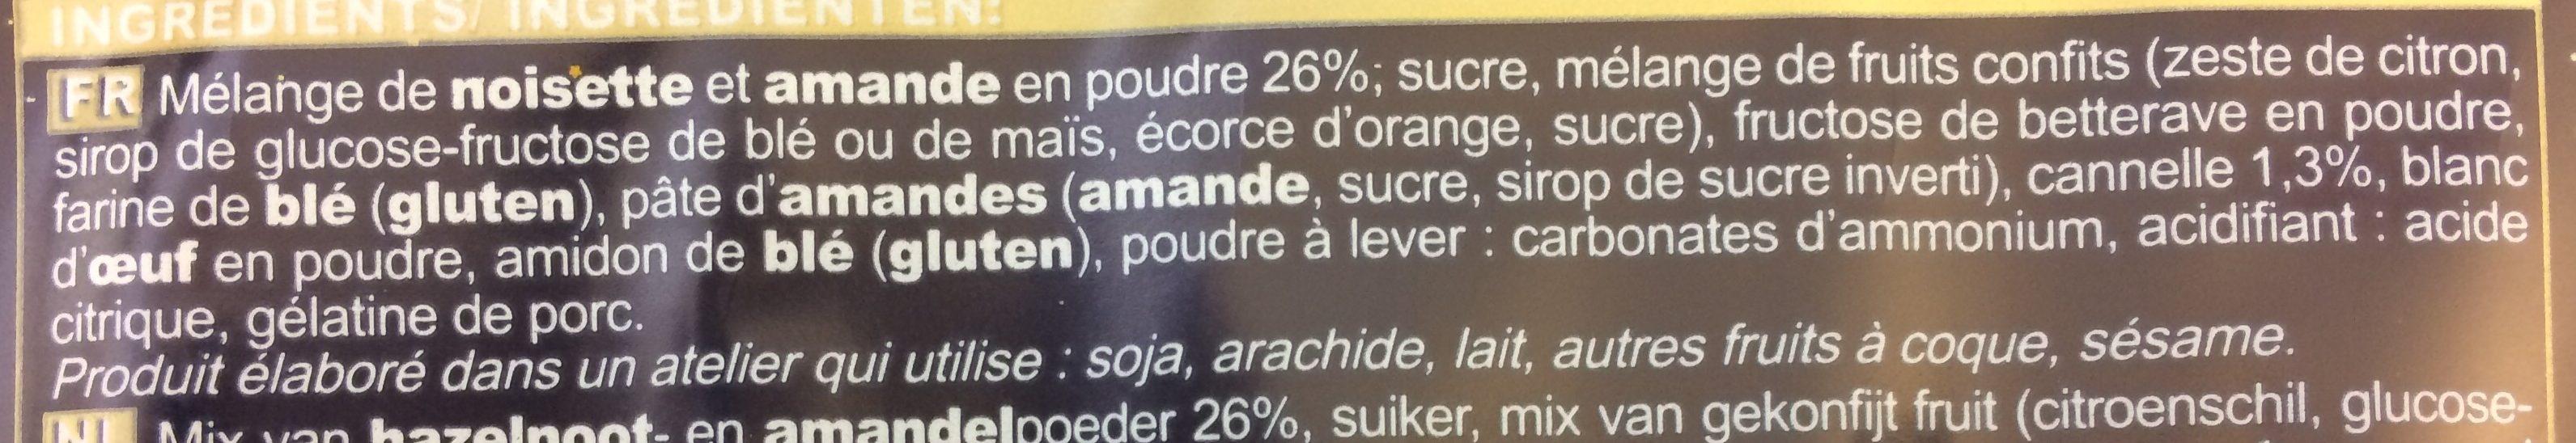 Biscuits Etoile Cannelle - Ingrédients - fr